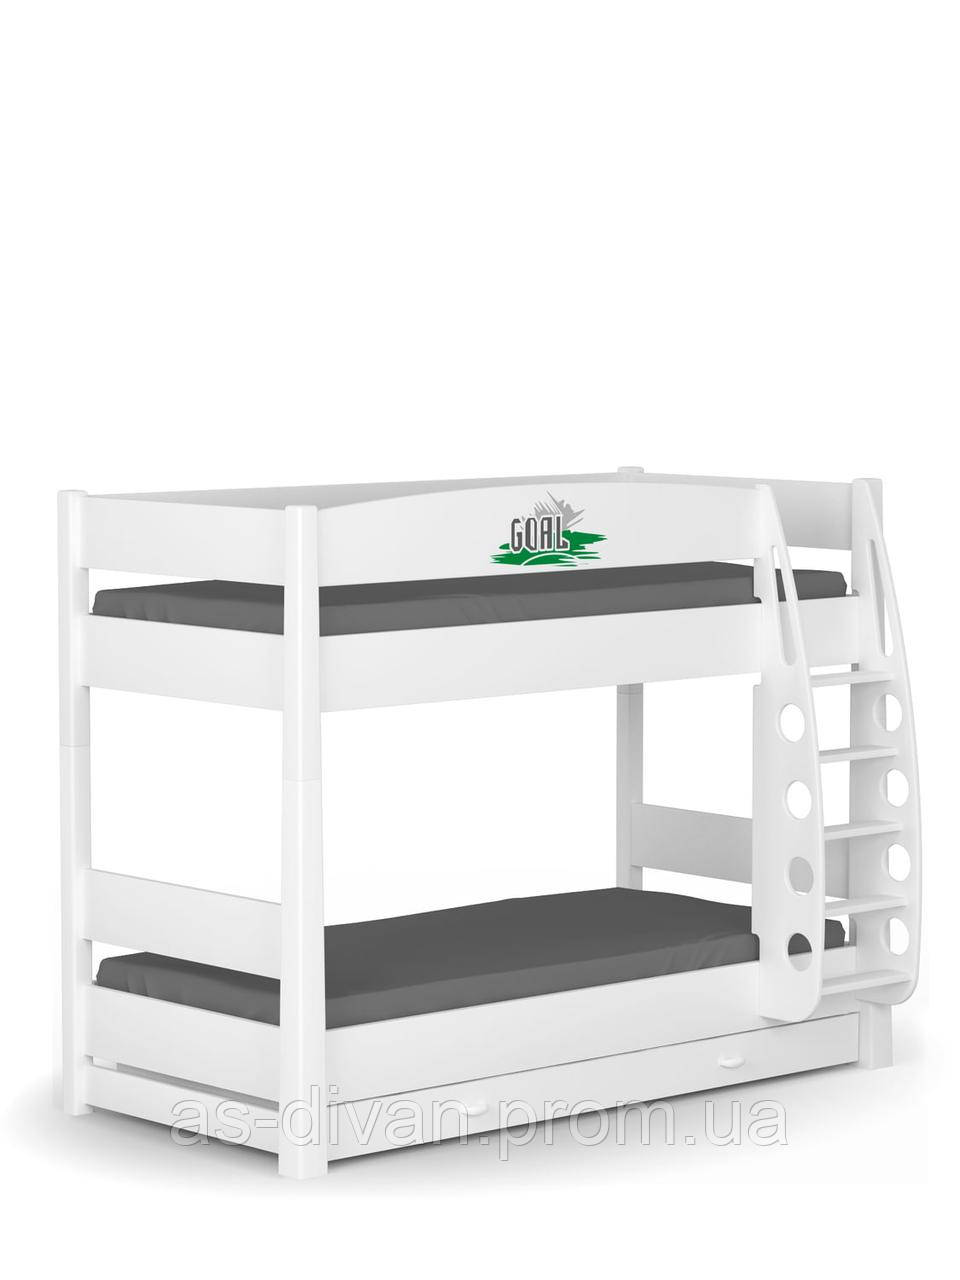 Кровать двухъярусная 90x190 Футбол